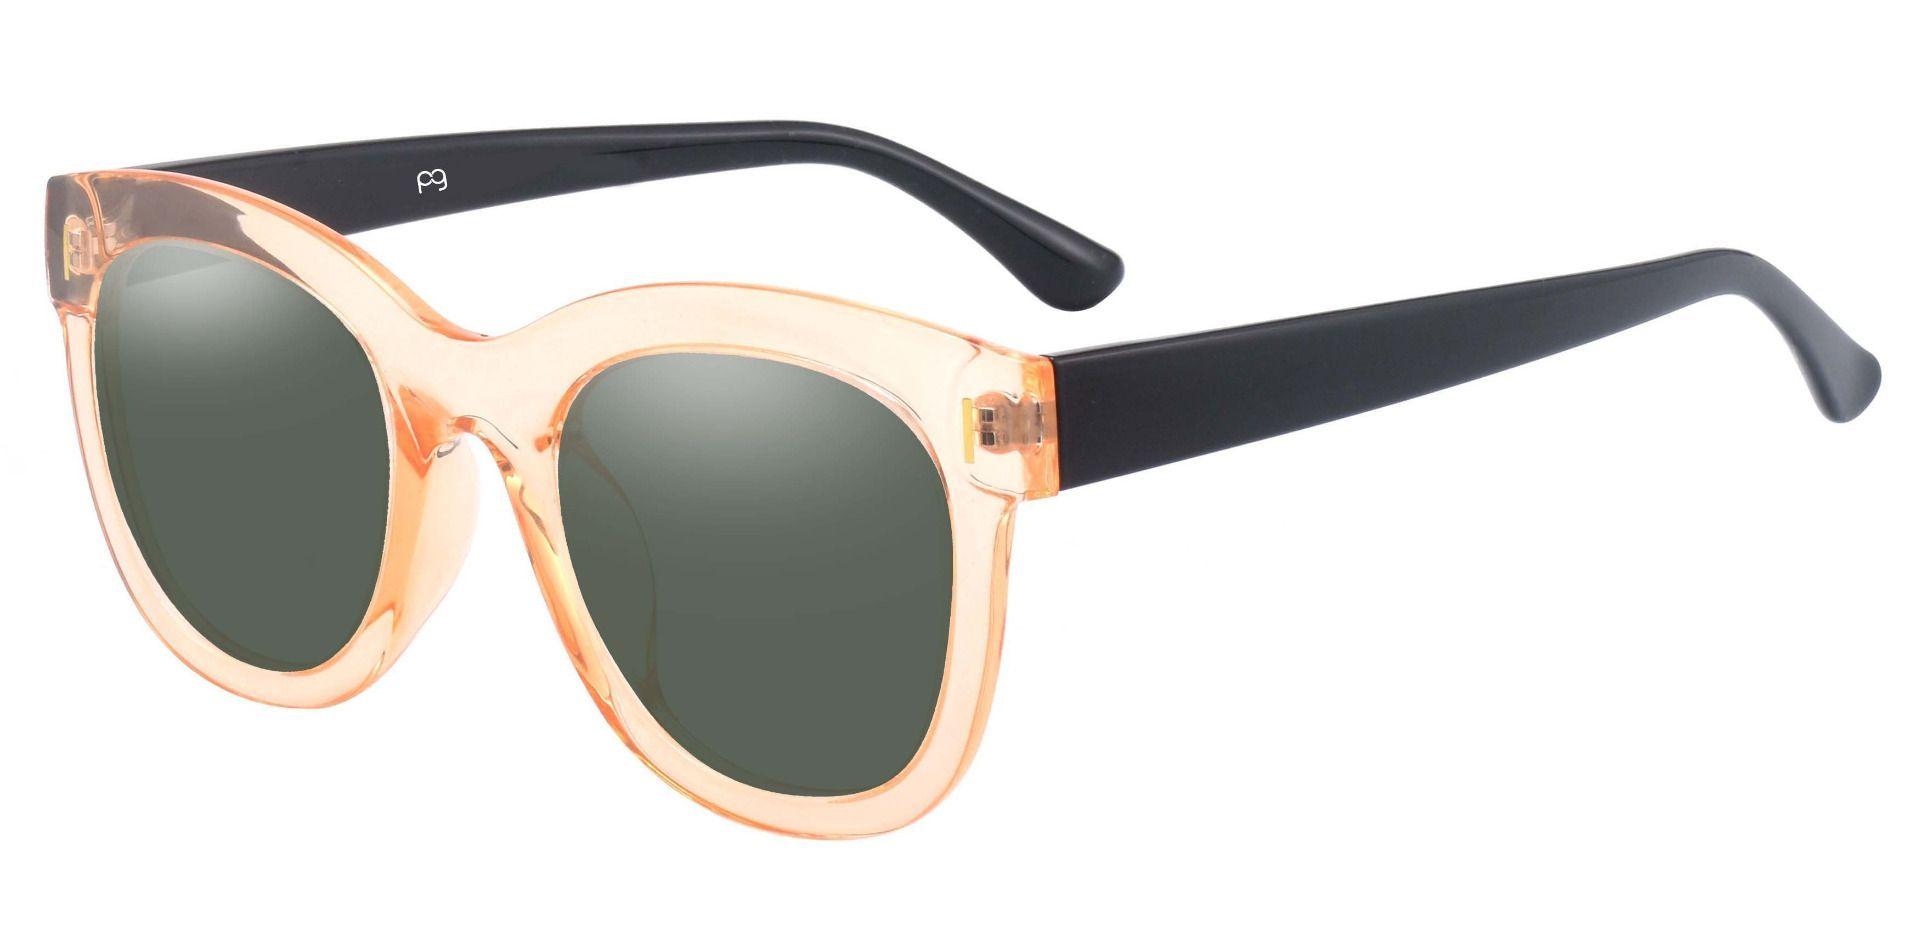 Saratoga Square Non-Rx Sunglasses - Brown Frame With Green Lenses